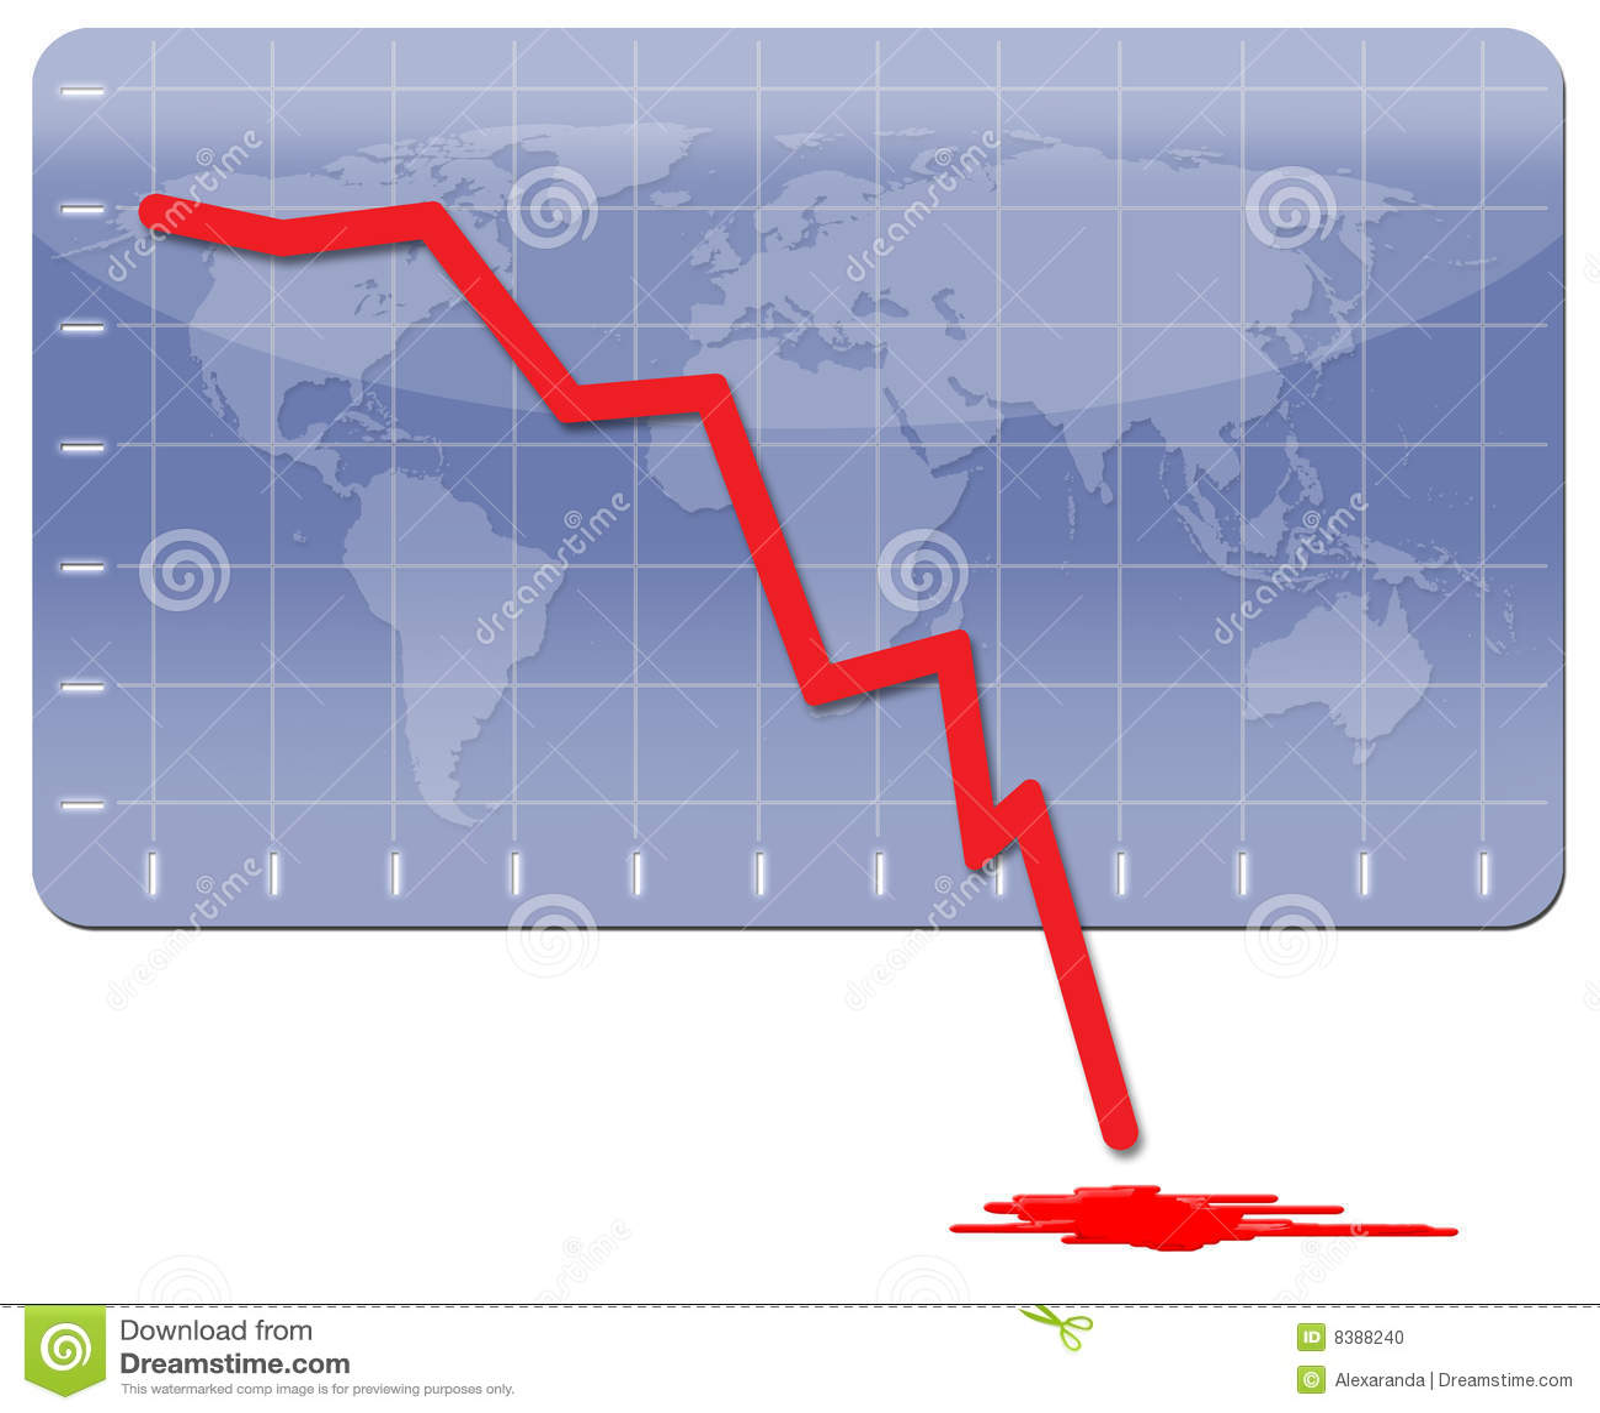 http://thumbs.dreamstime.com/z/globale-wirtschaftskrise-8388240.jpg